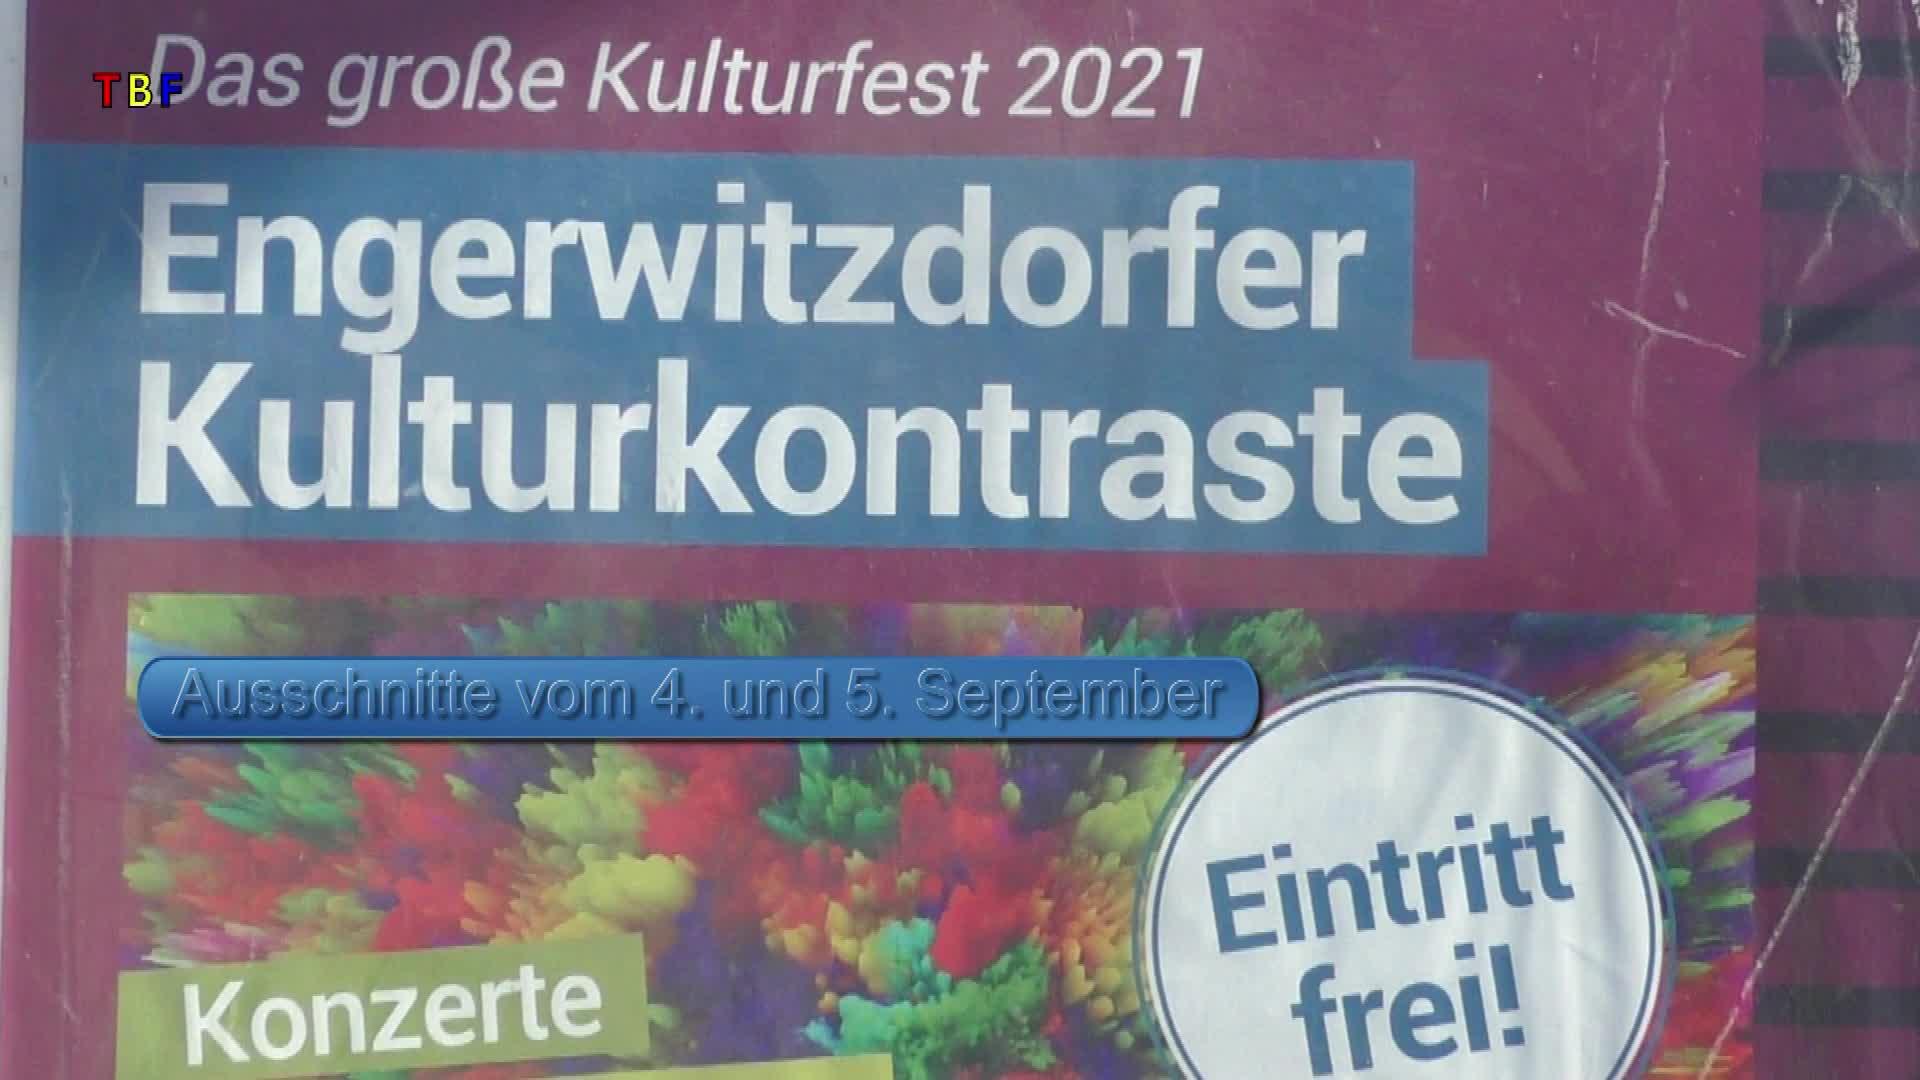 Engerwitzdorfer Kulturkontraste 2021